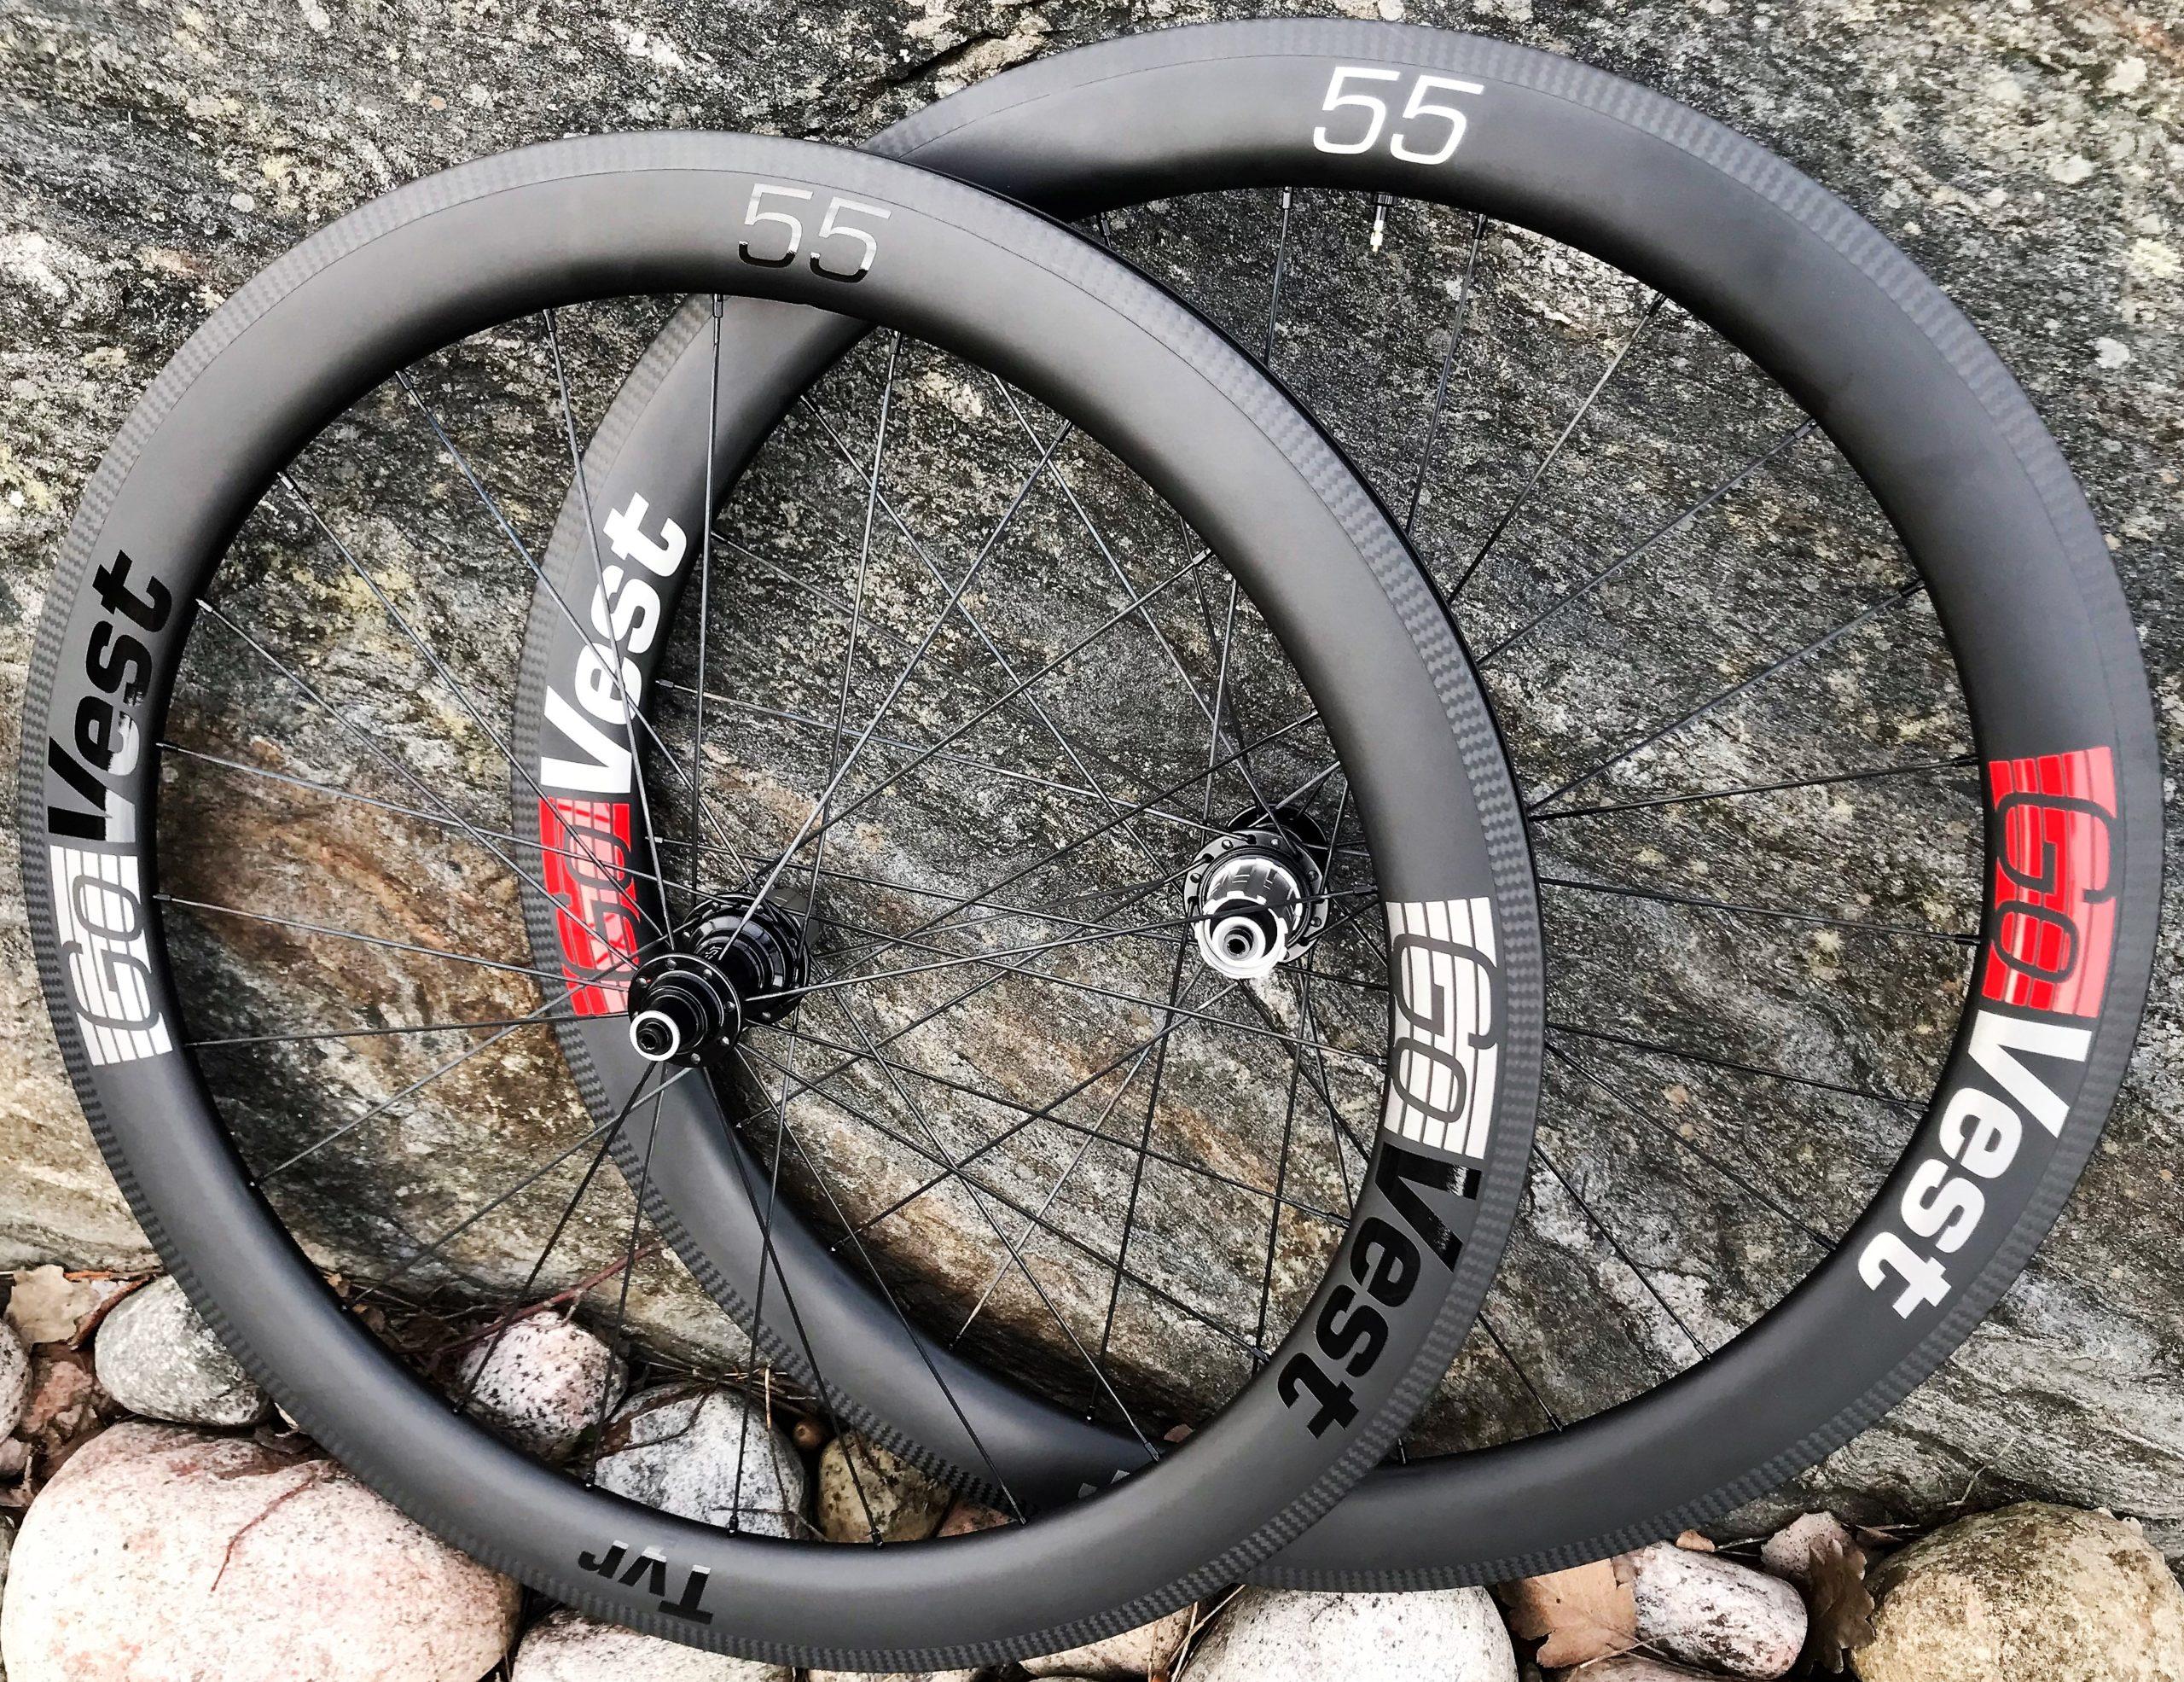 Tyr55 - 2019 Testhjul